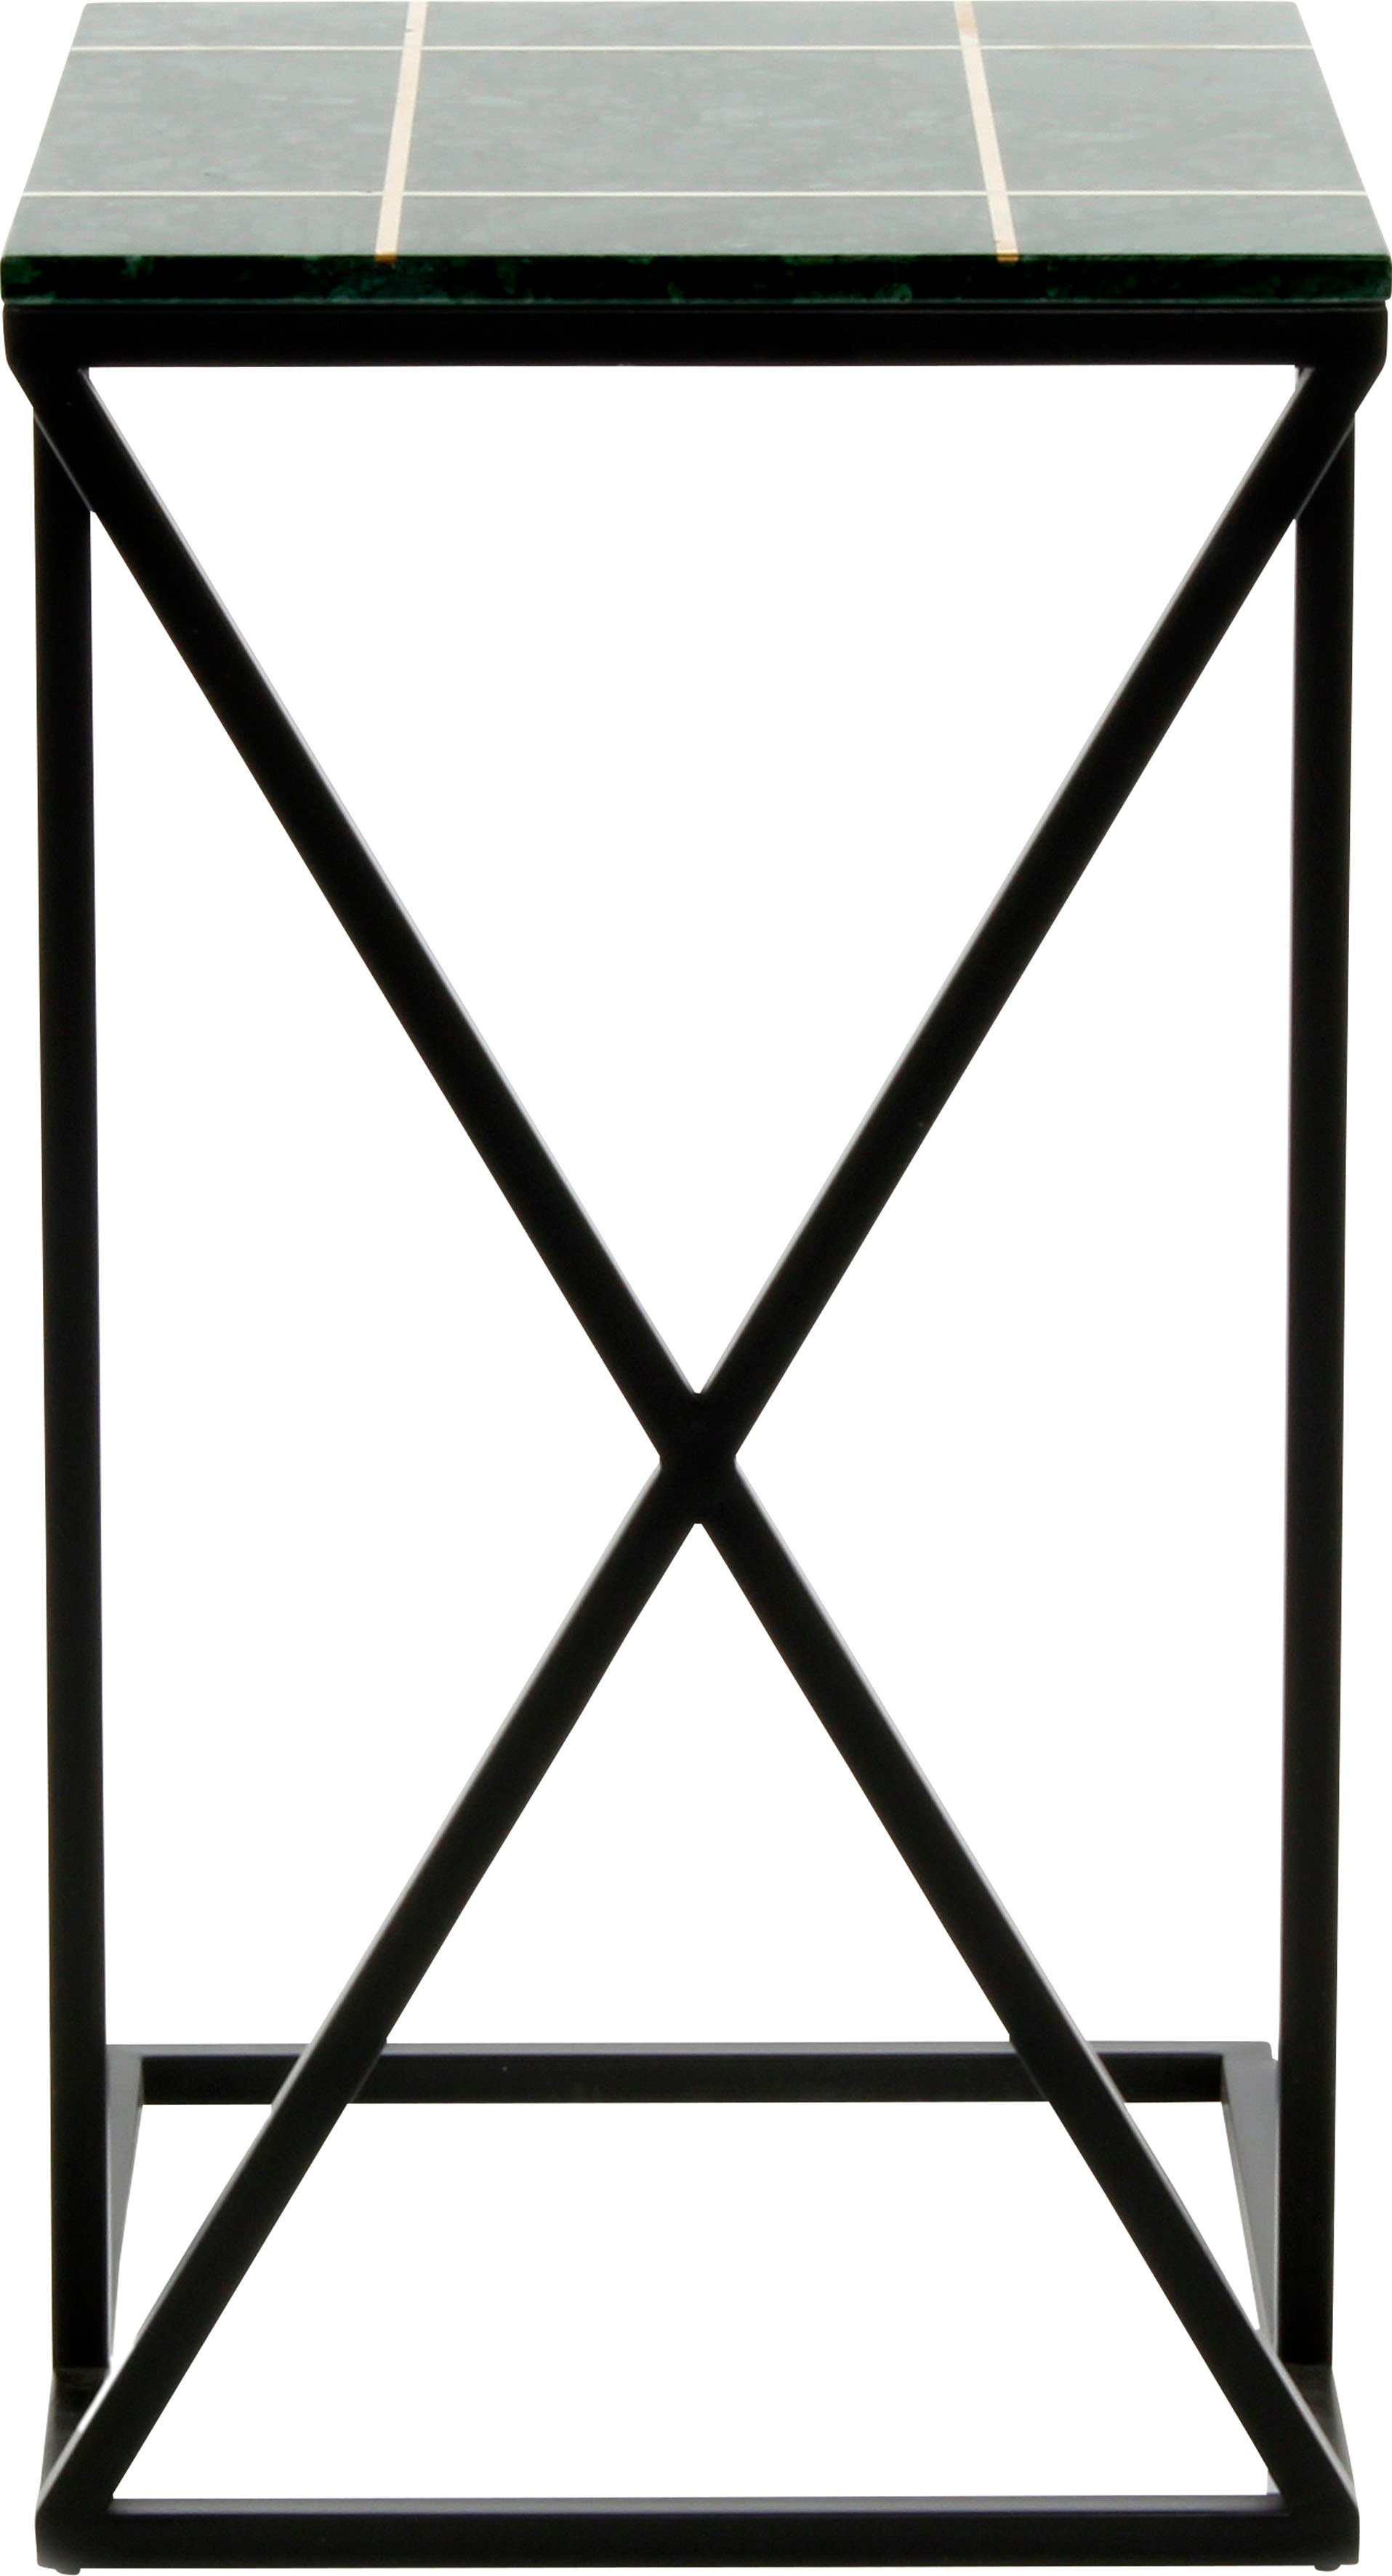 Kayoom bijzettafeltje Bijzettafel Louis 125 Marmer-tafelblad - verschillende betaalmethodes